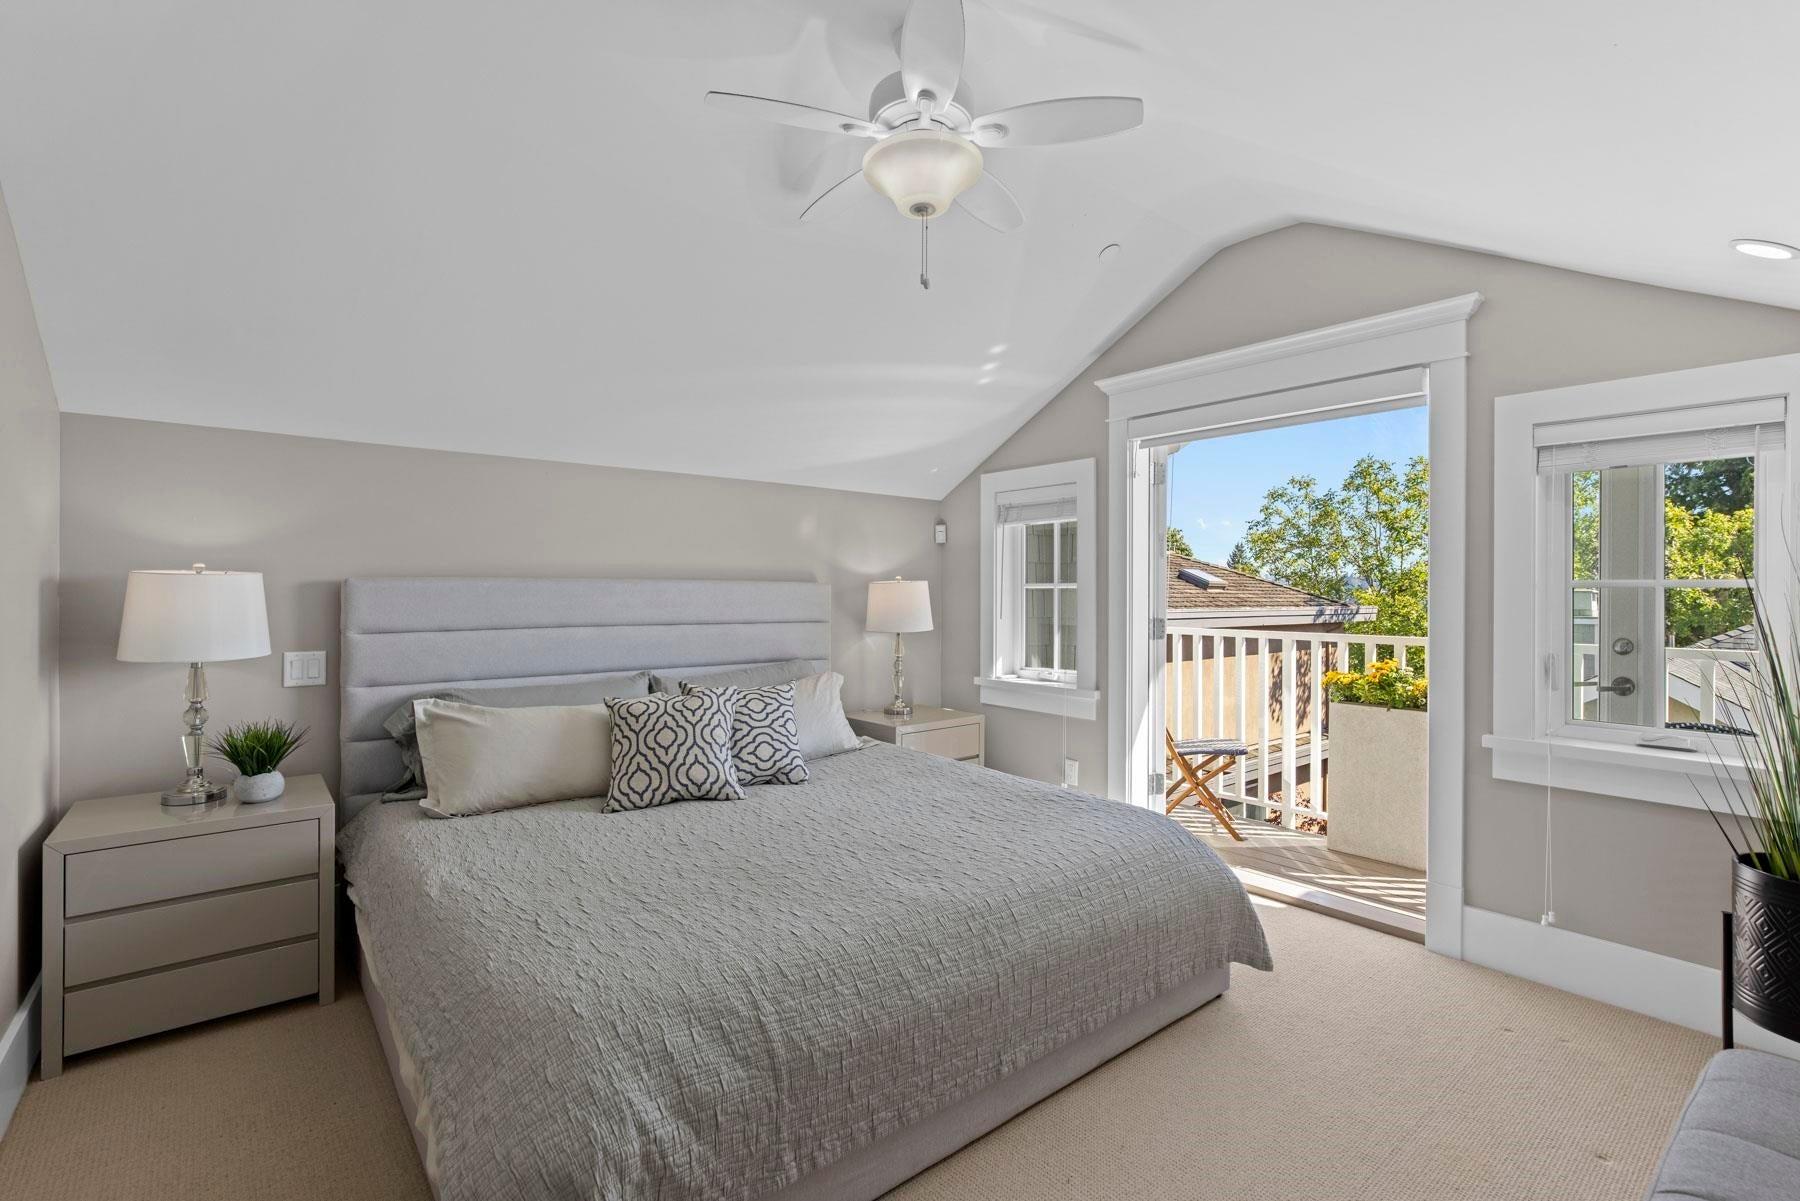 1421 GORDON AVENUE - Ambleside House/Single Family for sale, 3 Bedrooms (R2617756) - #8